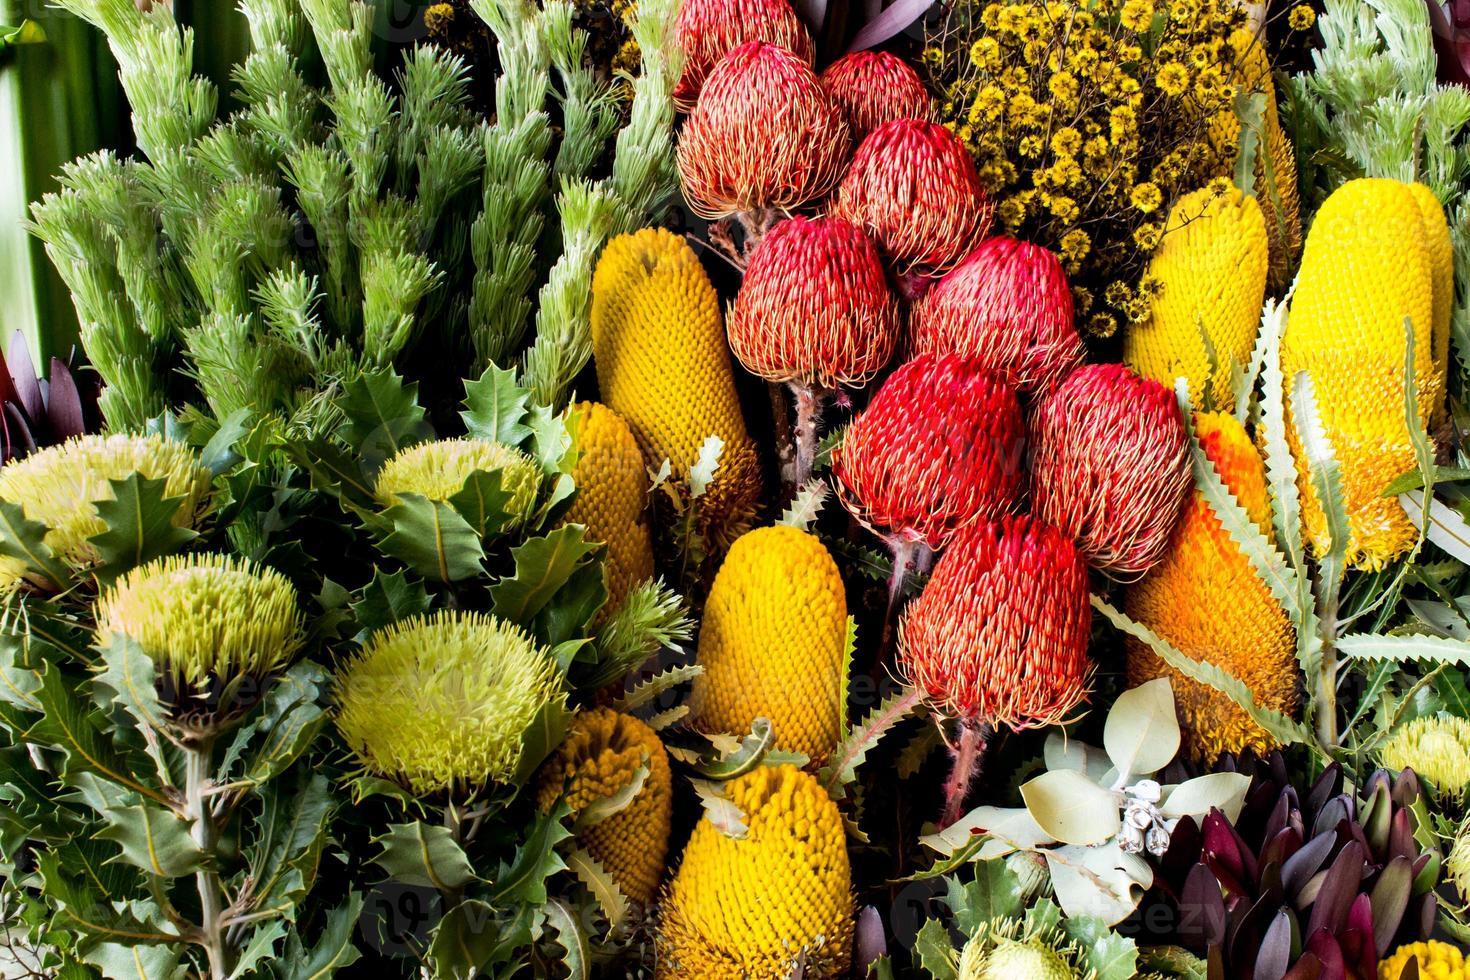 Australian Banksia et Waratah fleurs sauvages photo